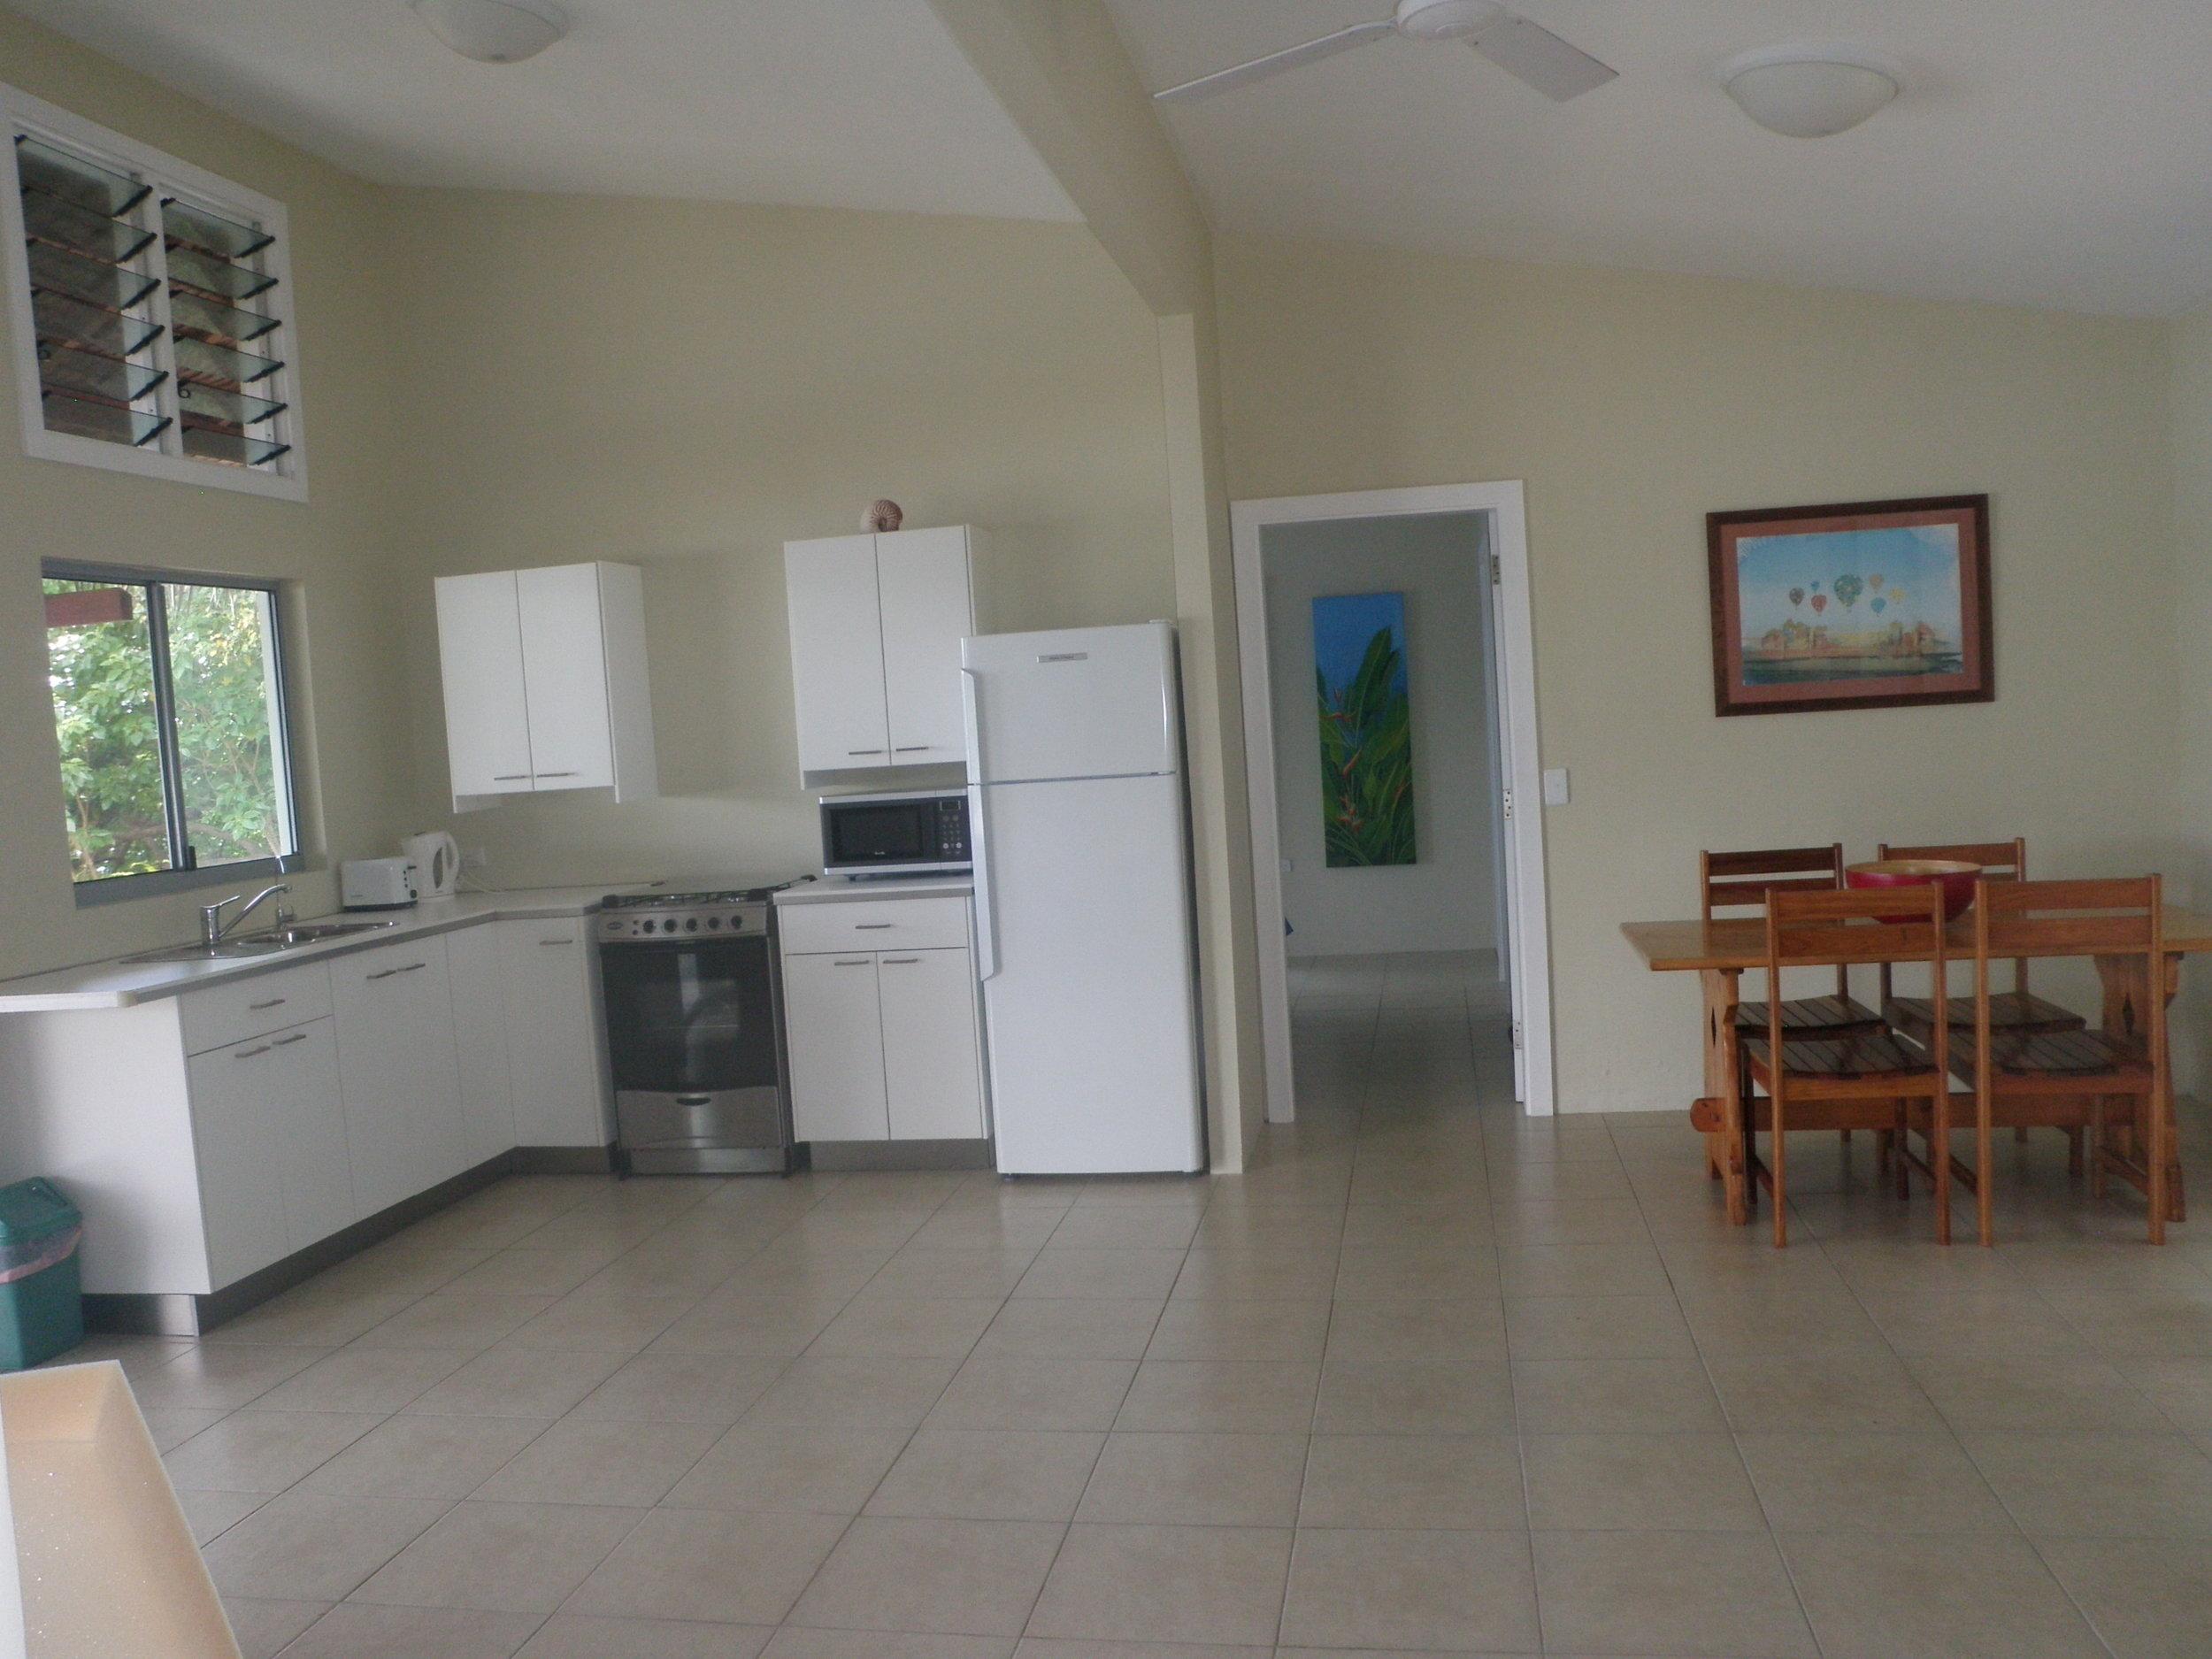 Malvanua kitchen.jpg